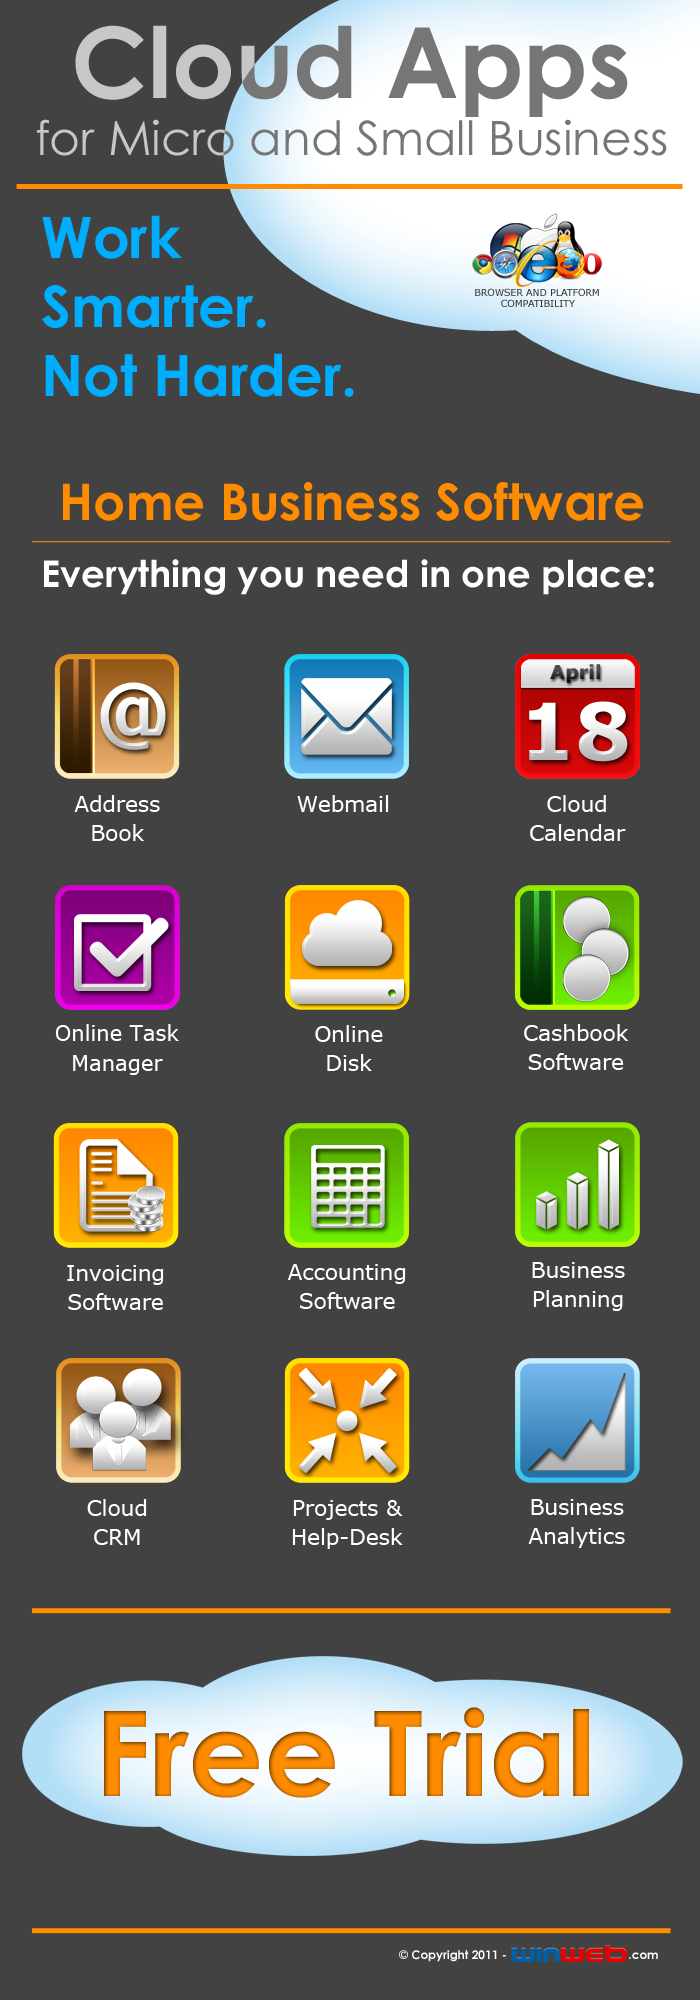 winweb easy online cloud web based home business software app